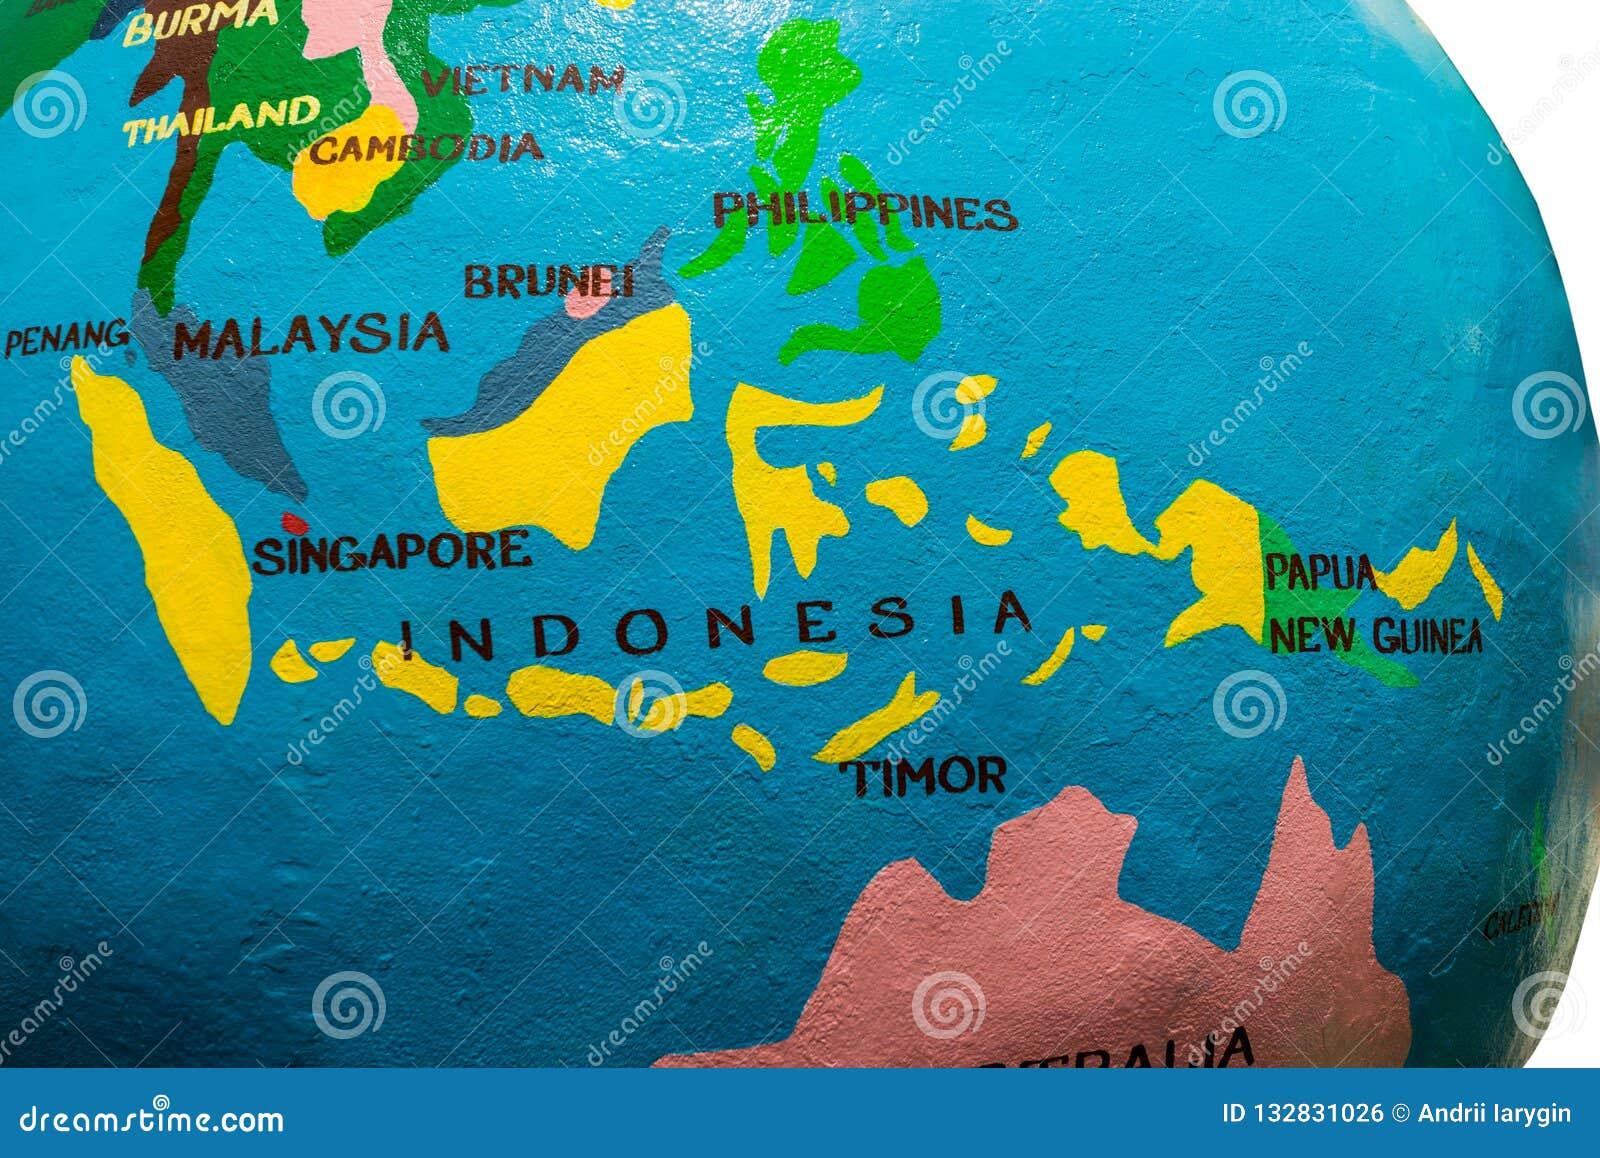 Indonesia and malaysia map